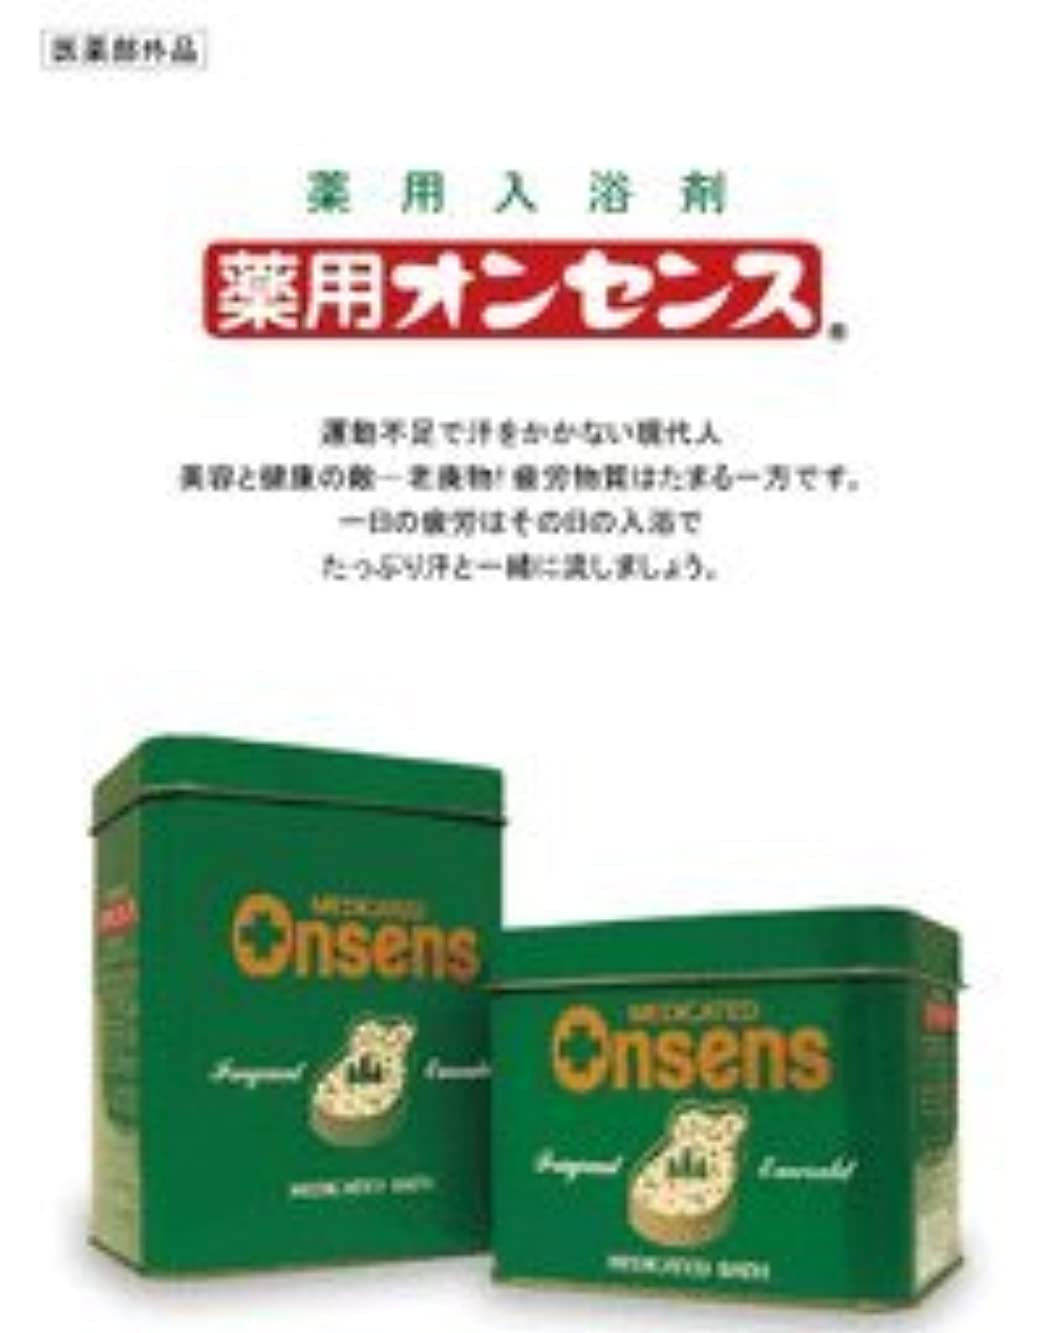 優先権使役鮫薬用オンセンス 1.4kg缶 薬用入浴剤 松葉エキス(松柏科植物の製油) 入浴剤 医薬部外品